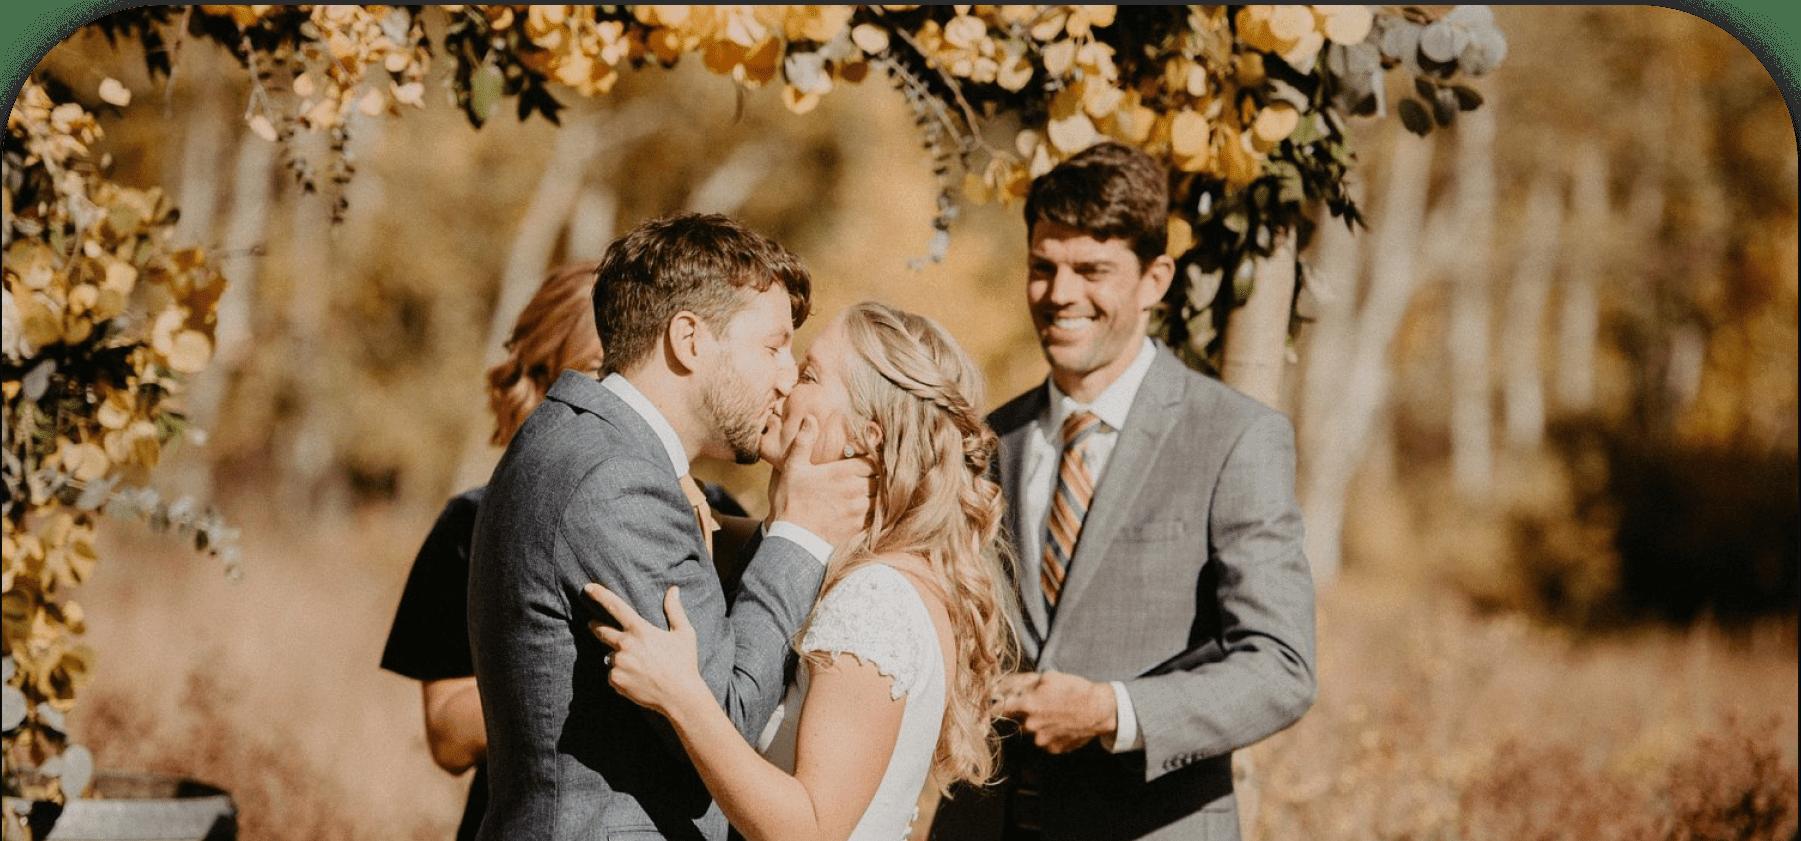 intimate wedding package image